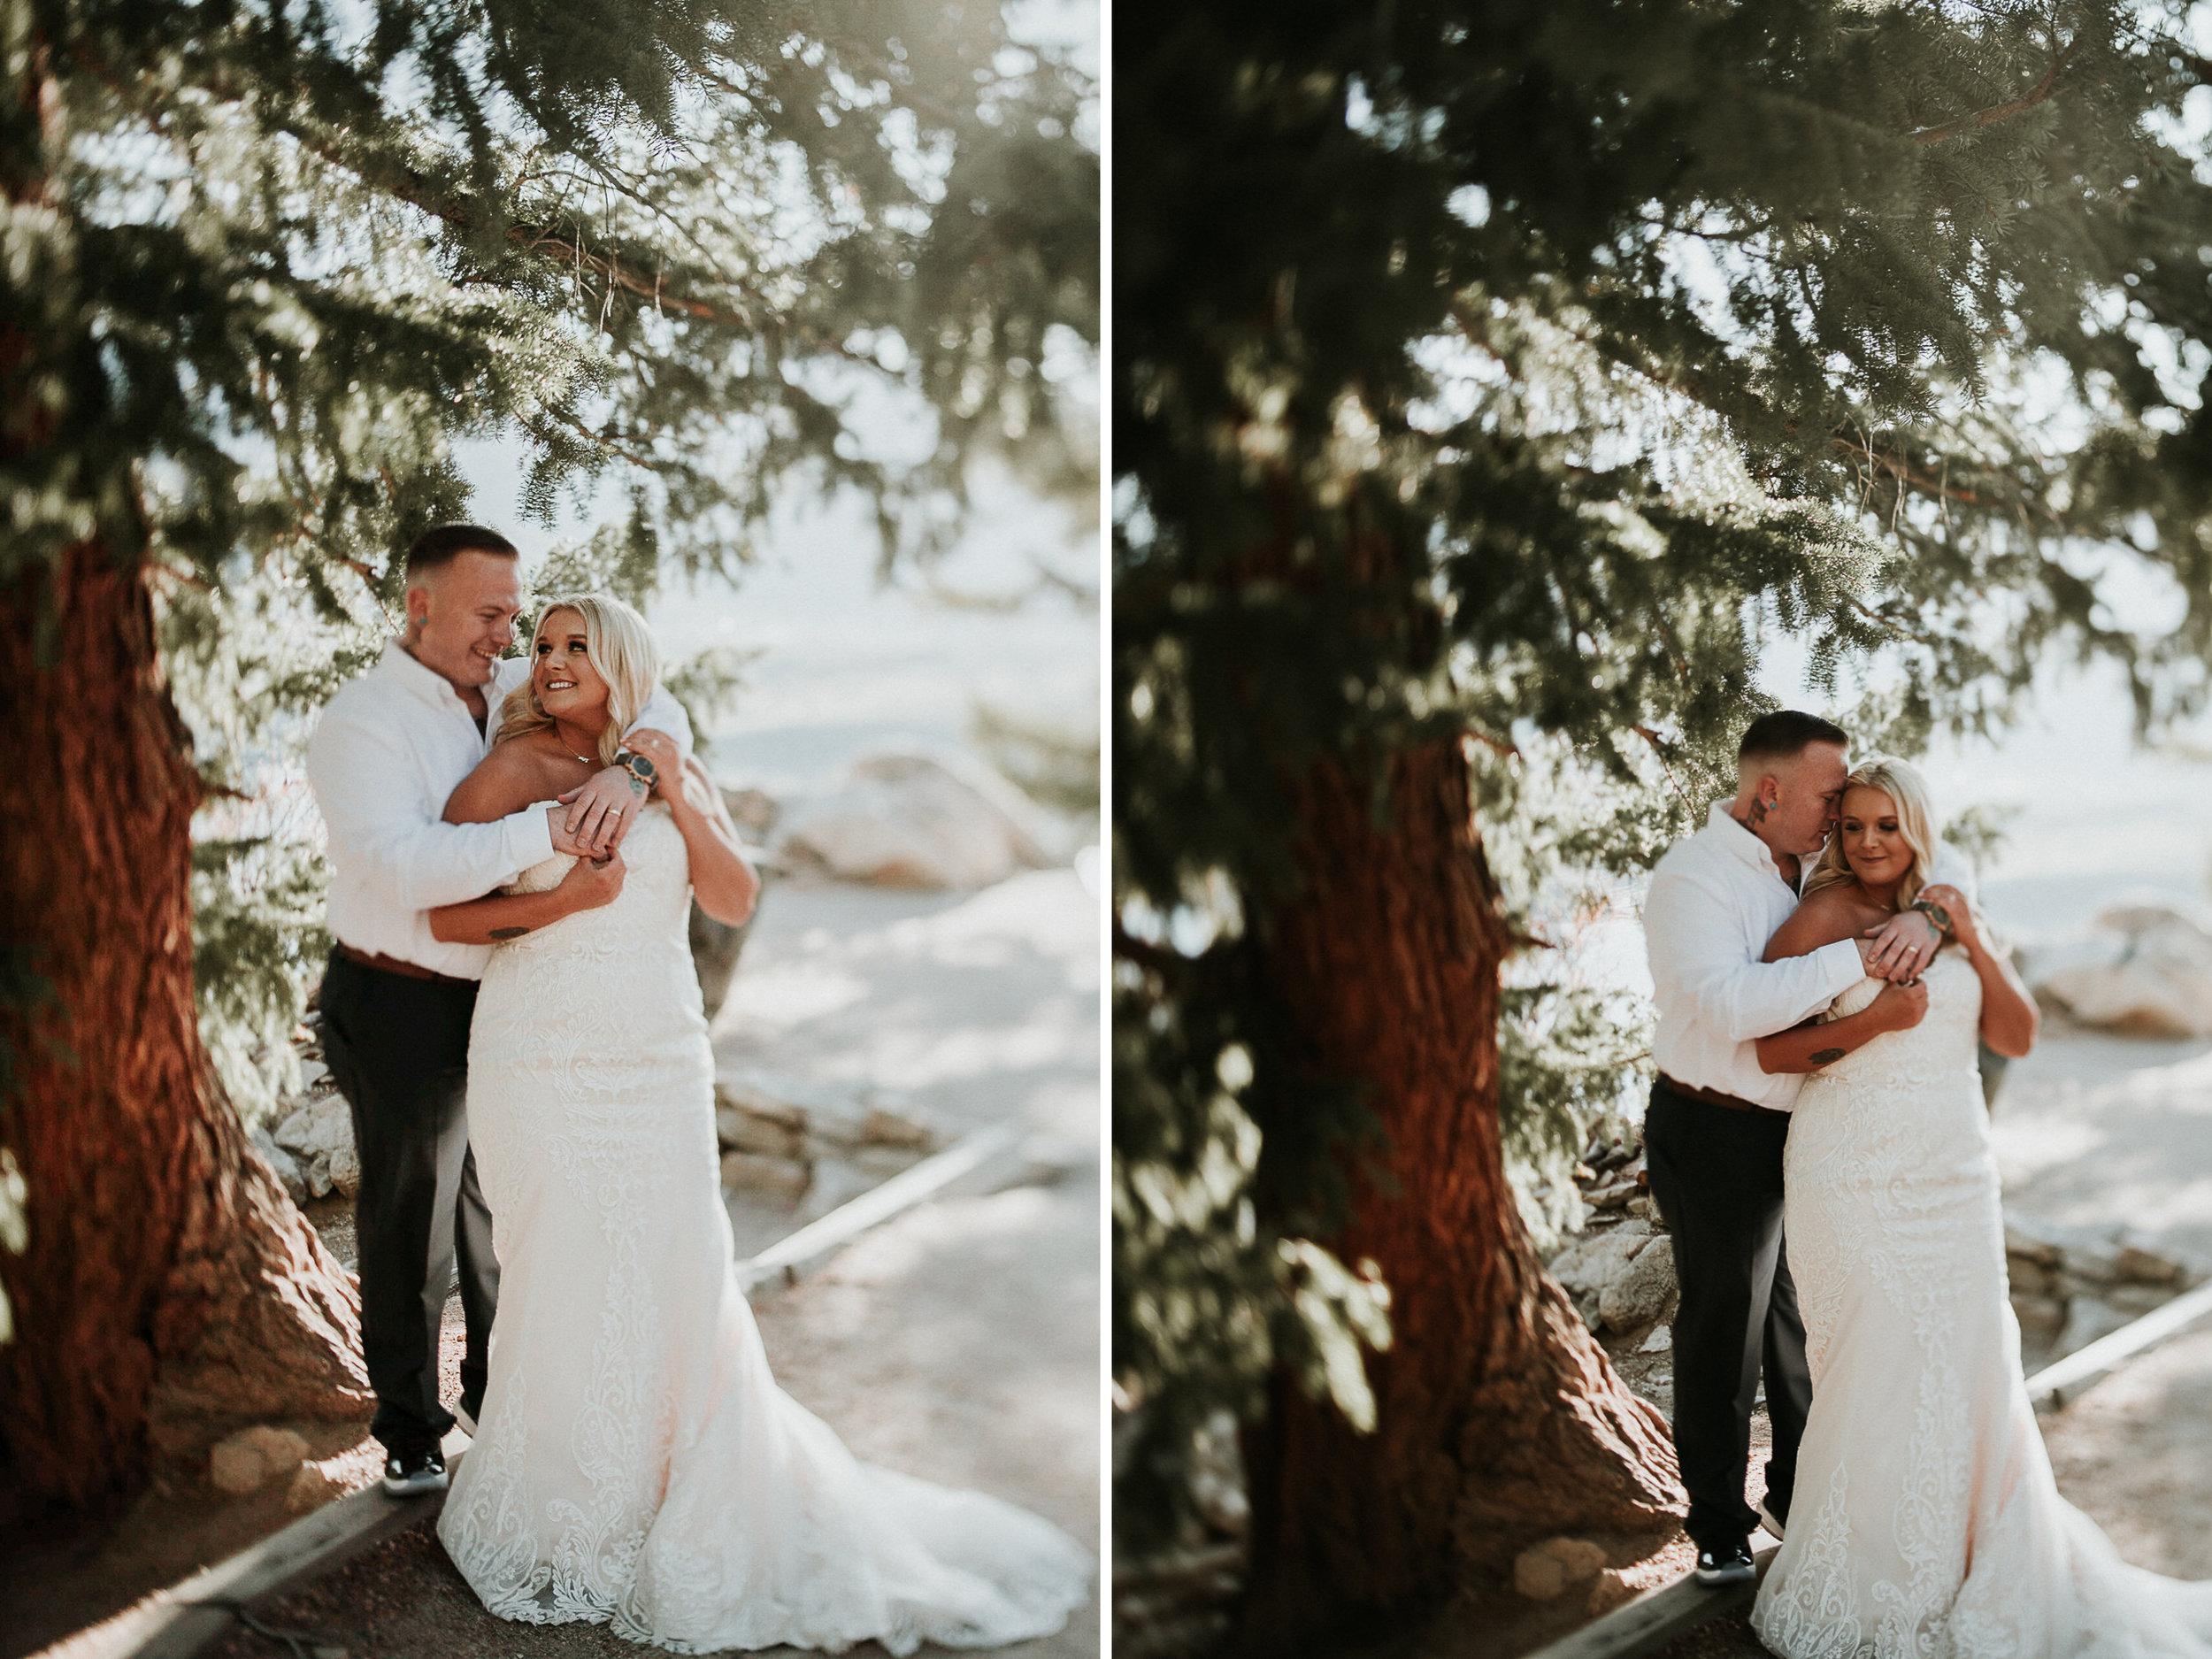 st. louis wedding photographer Zach&Rosalie - Lake Dillon CO Elopement 7.jpg